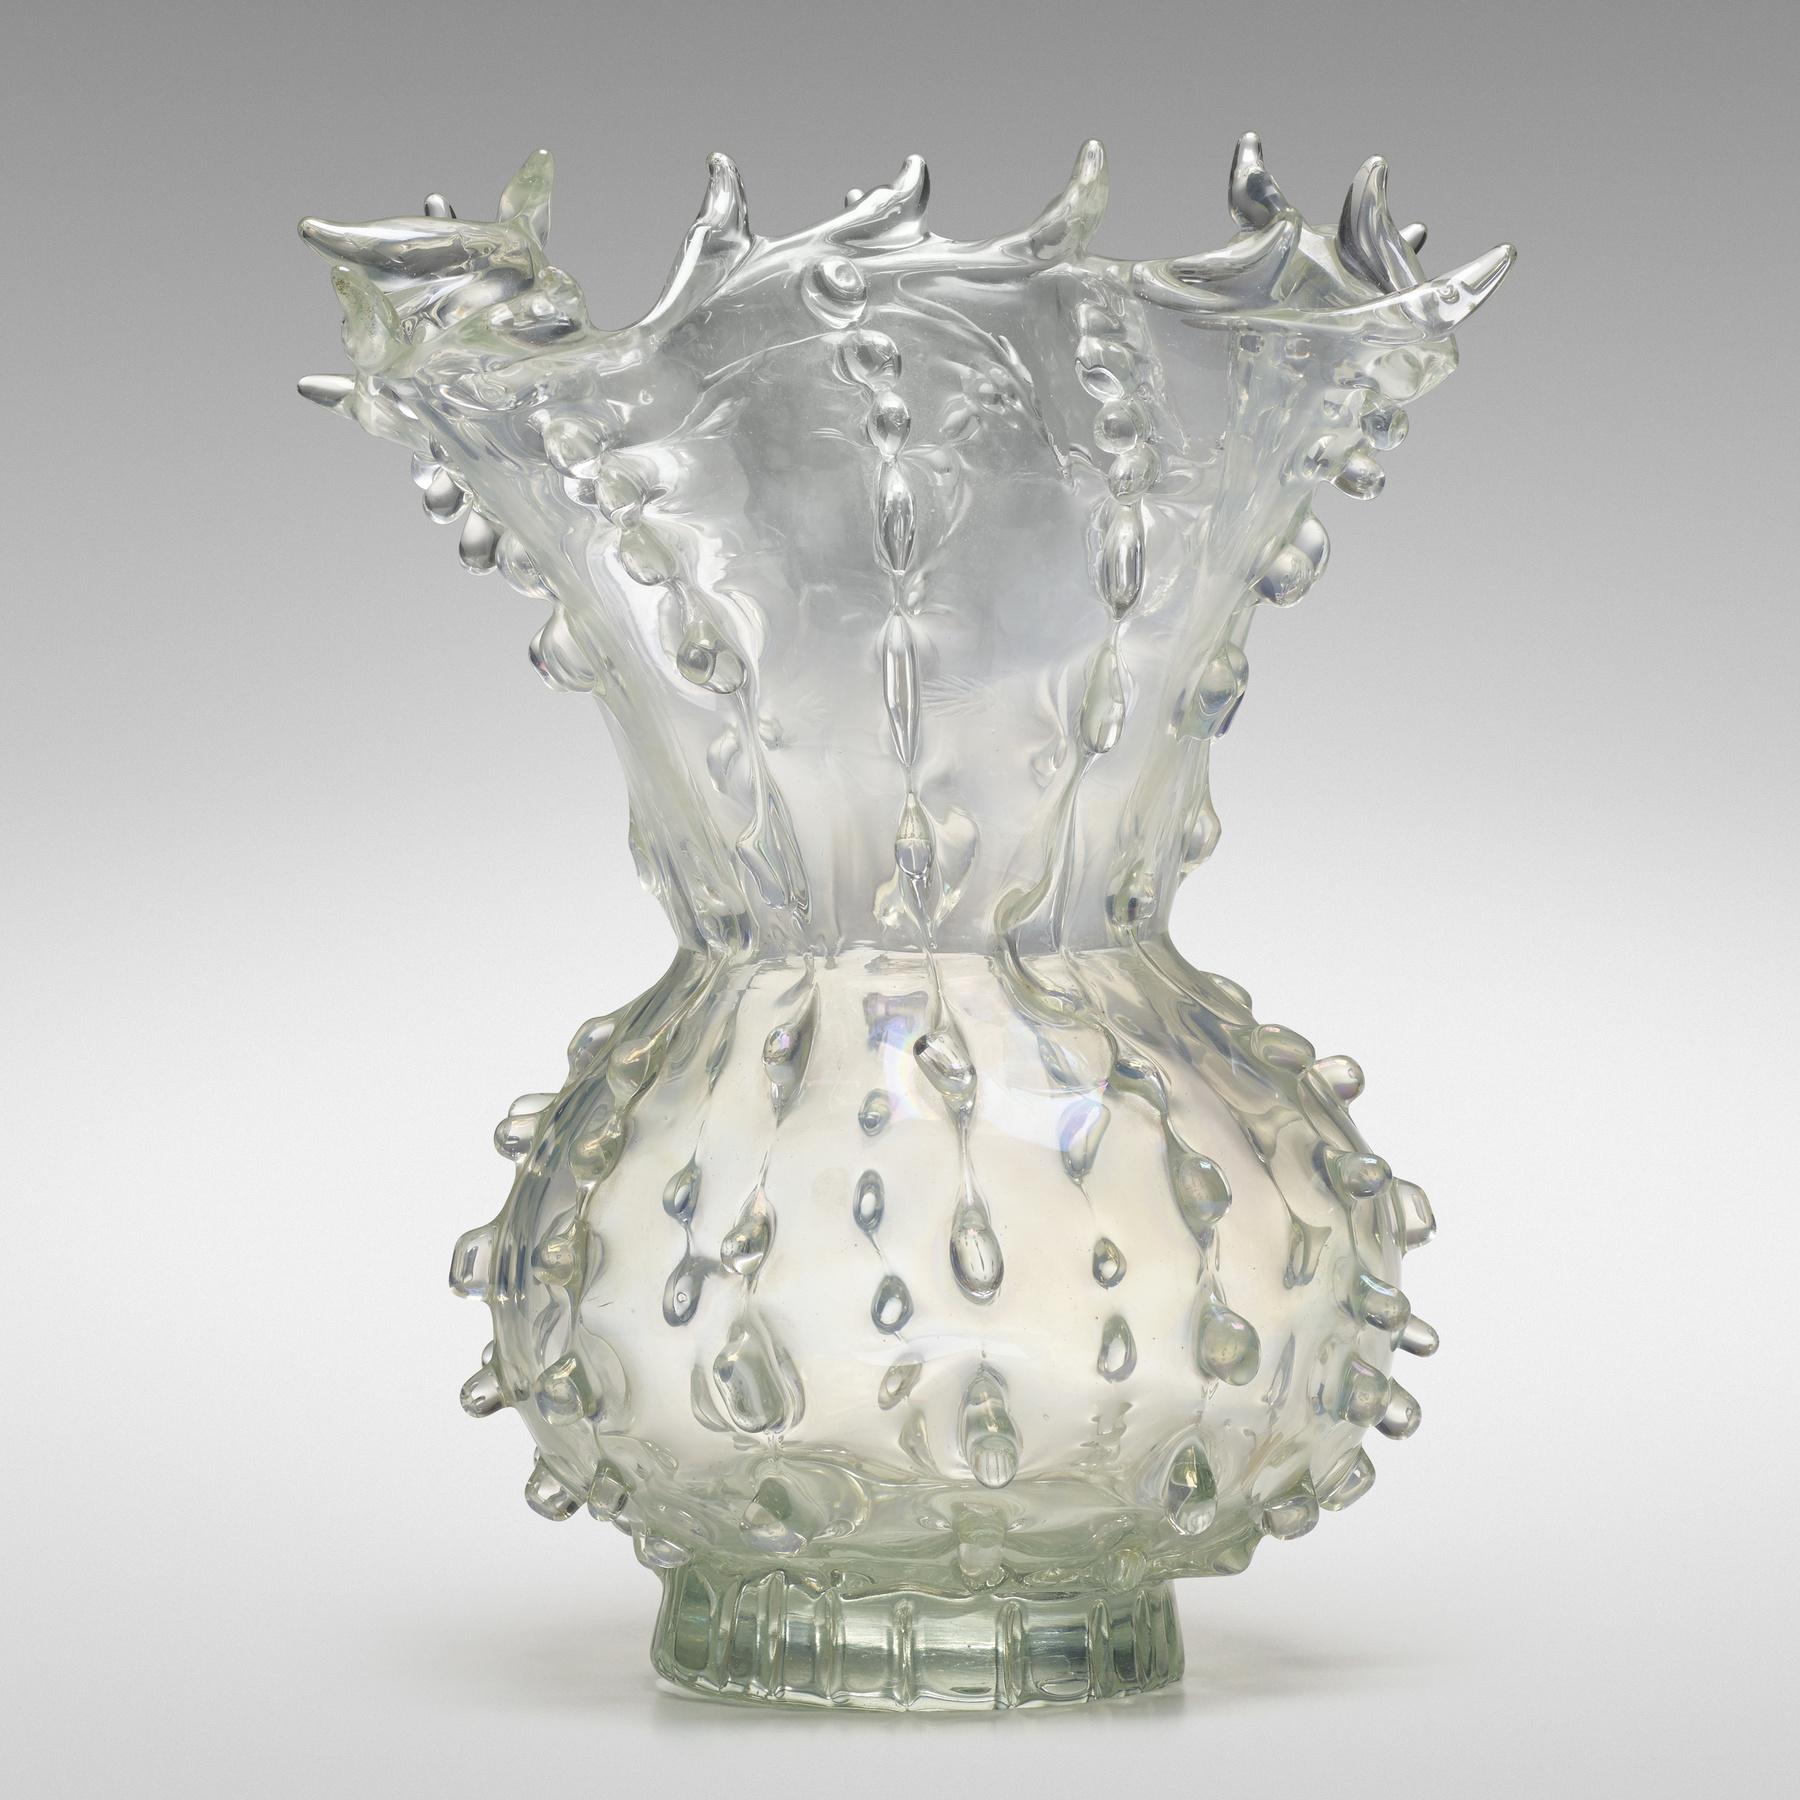 161 1 Important Italian Glass April 2020 Ercole Barovier Medusa Vase Wright Auction